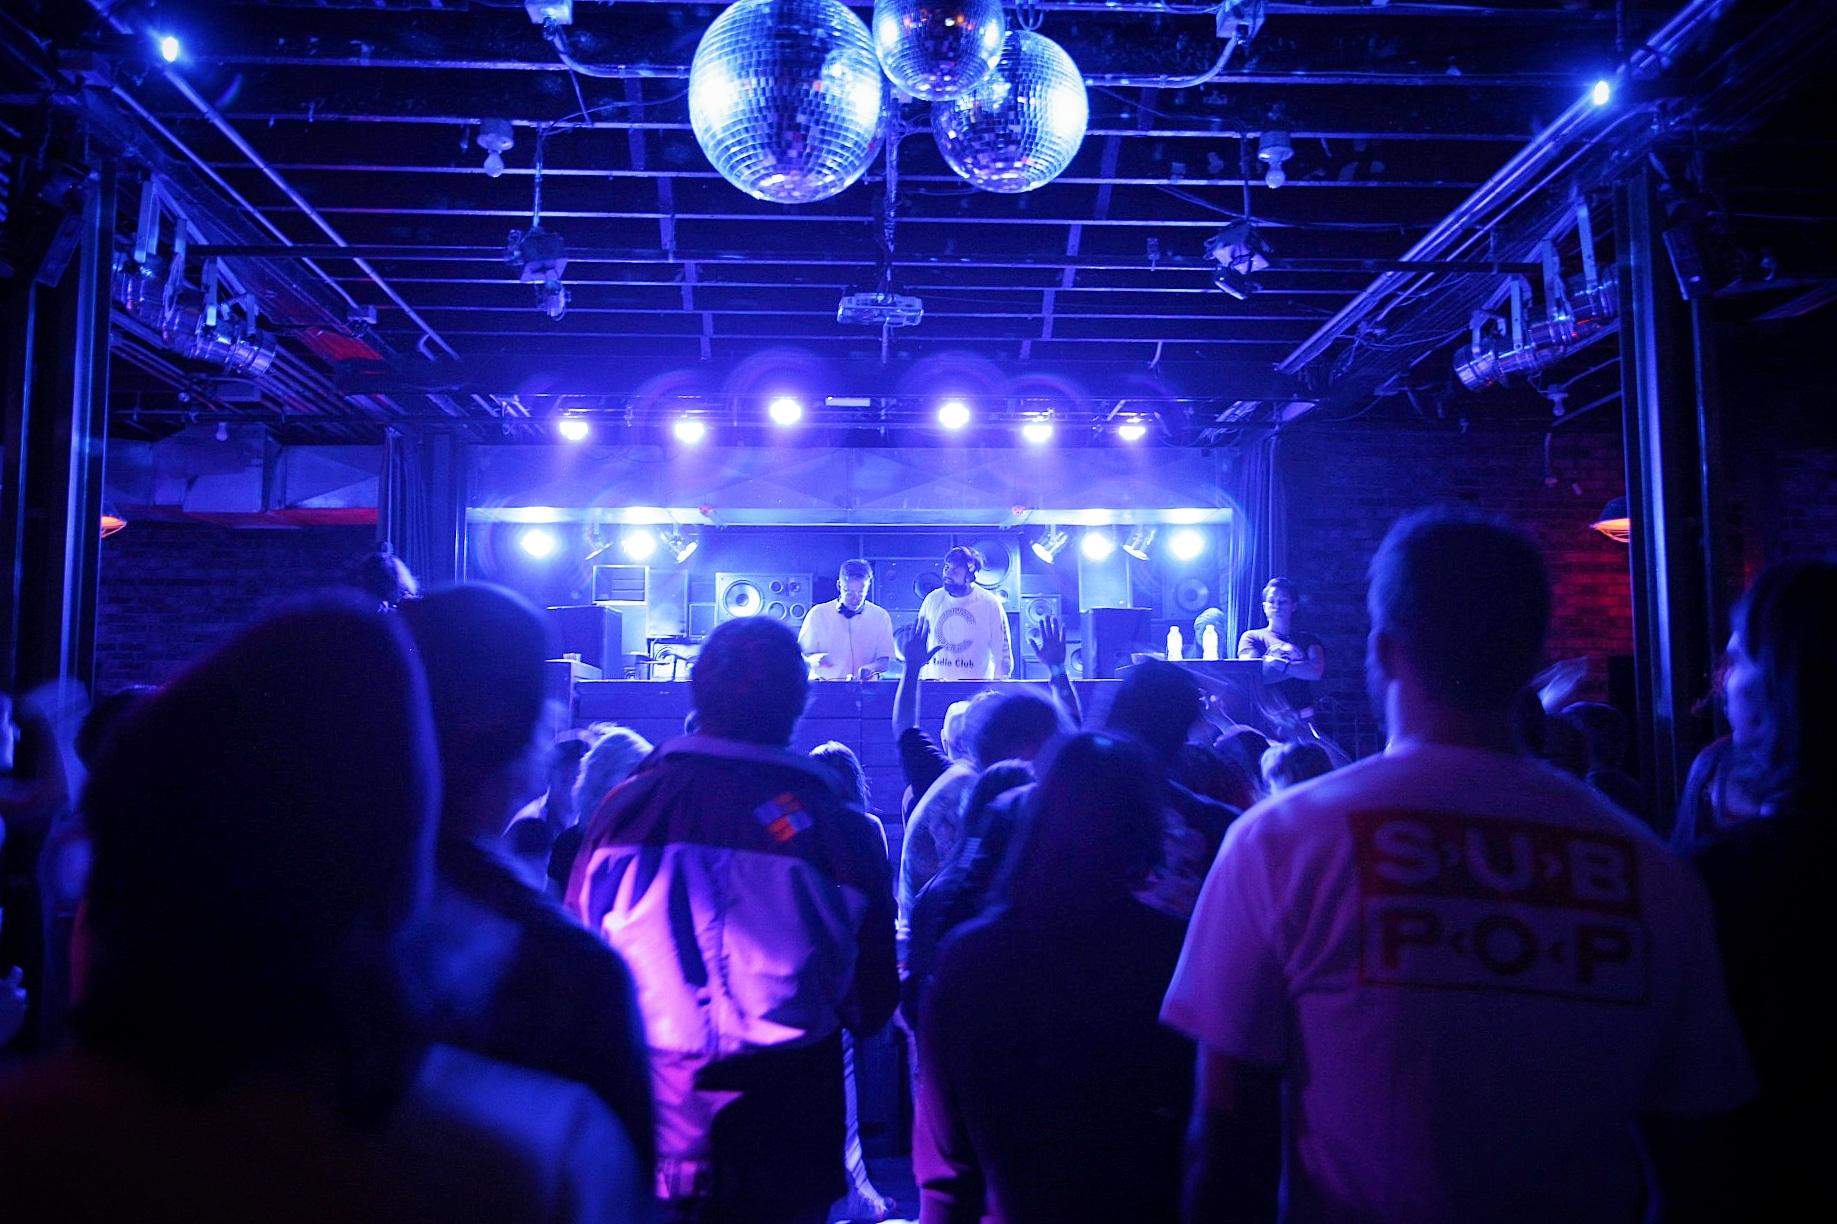 Concertsocks_DailyDrop_AEMCON_Friday_4.jpg